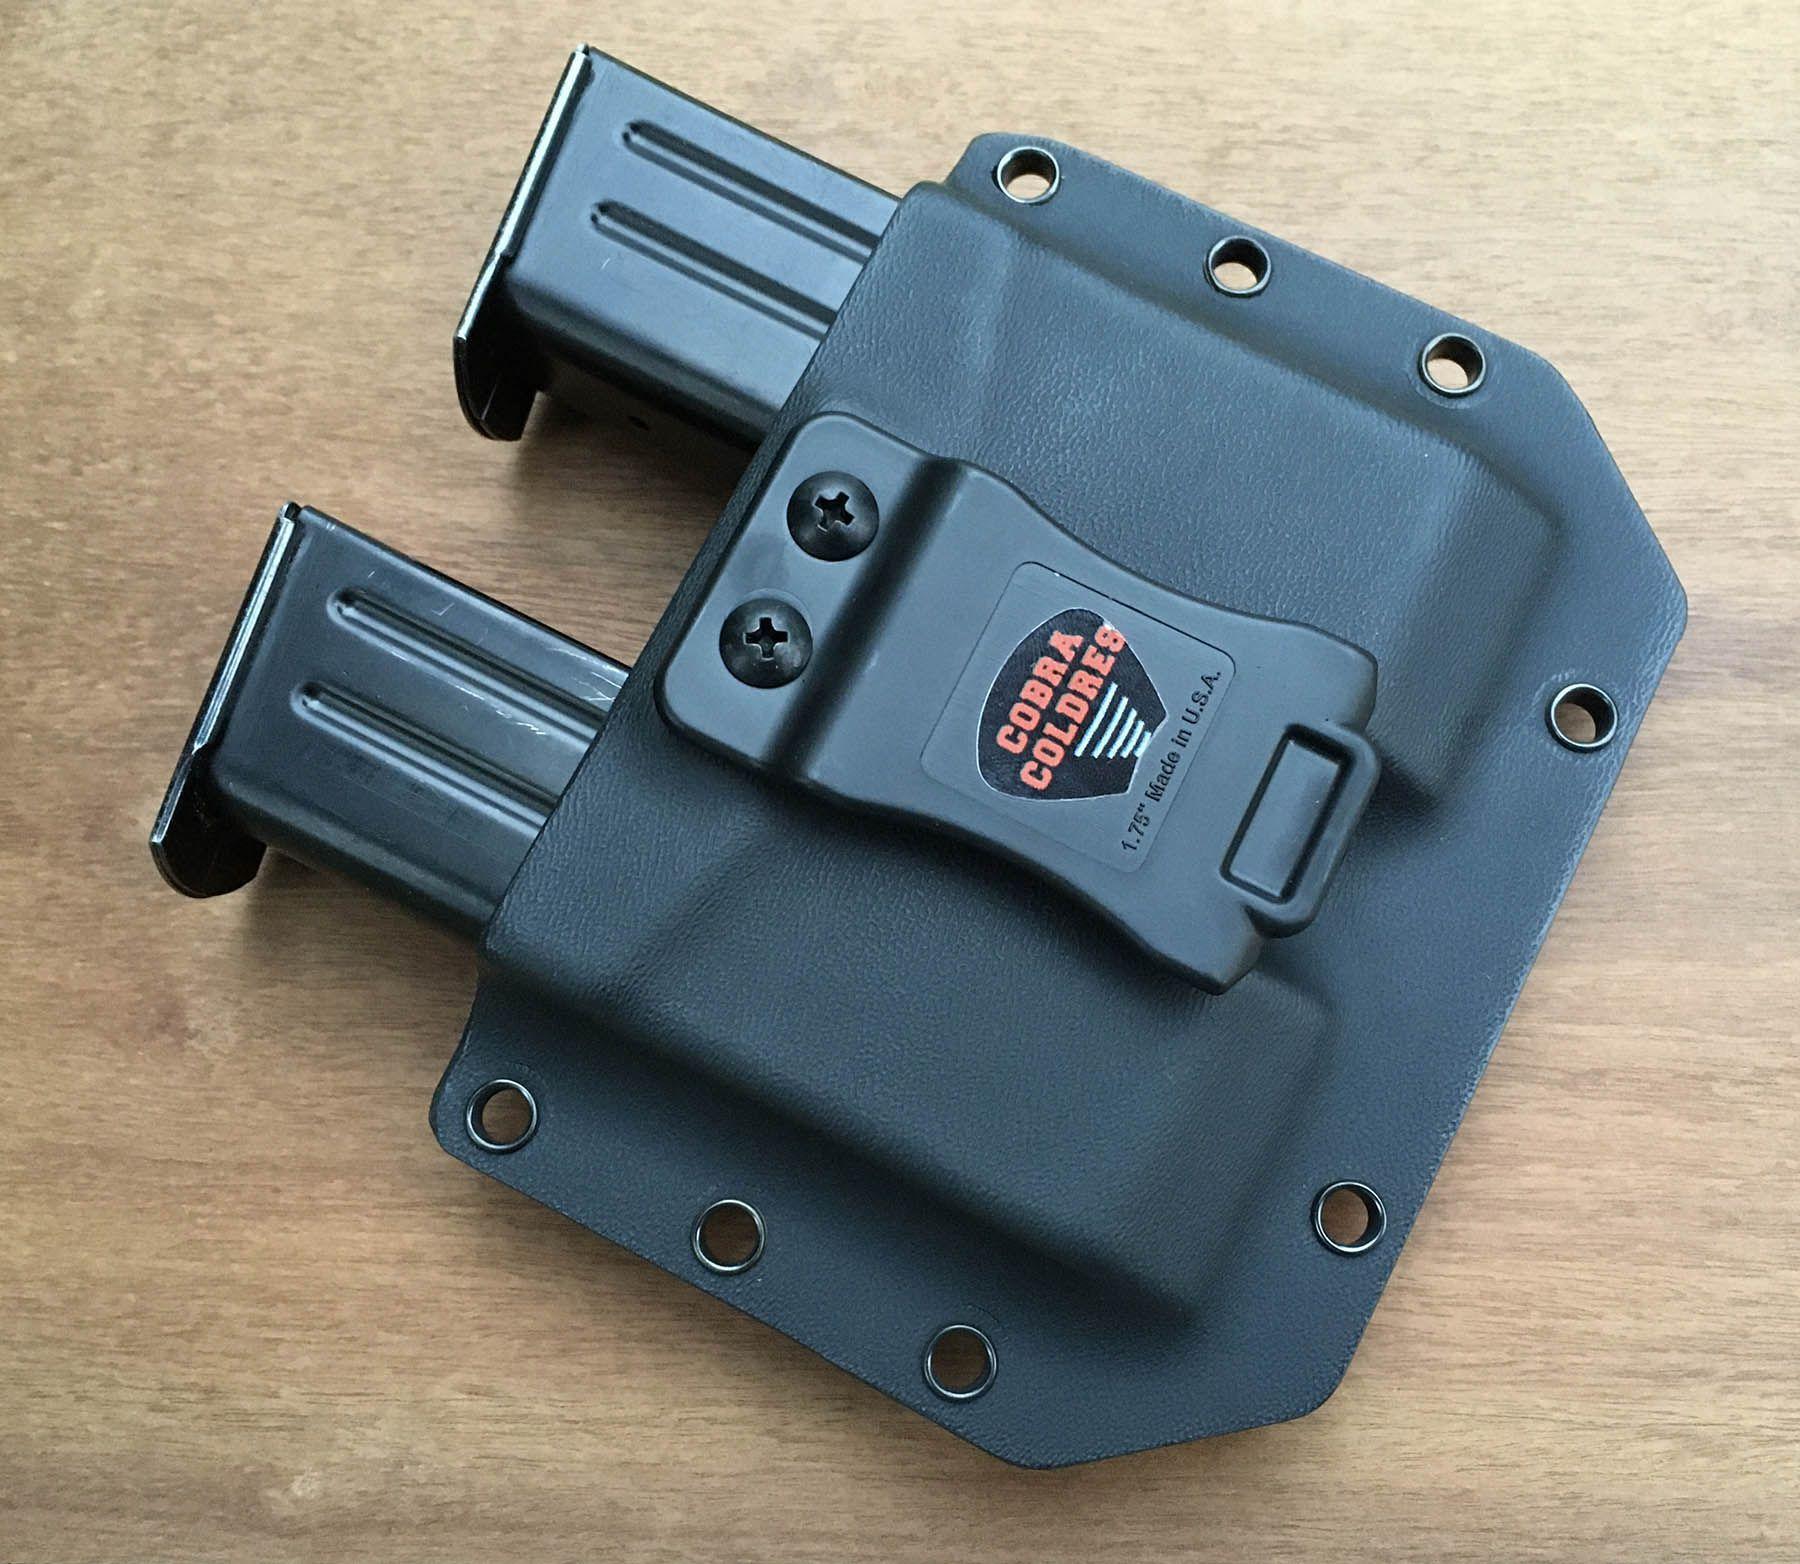 Porta Carregador Velado Duplo [Imbel Bifilar] [Glock Bifilar .40, 380 e 9mm] [Kydex] [Polímero]